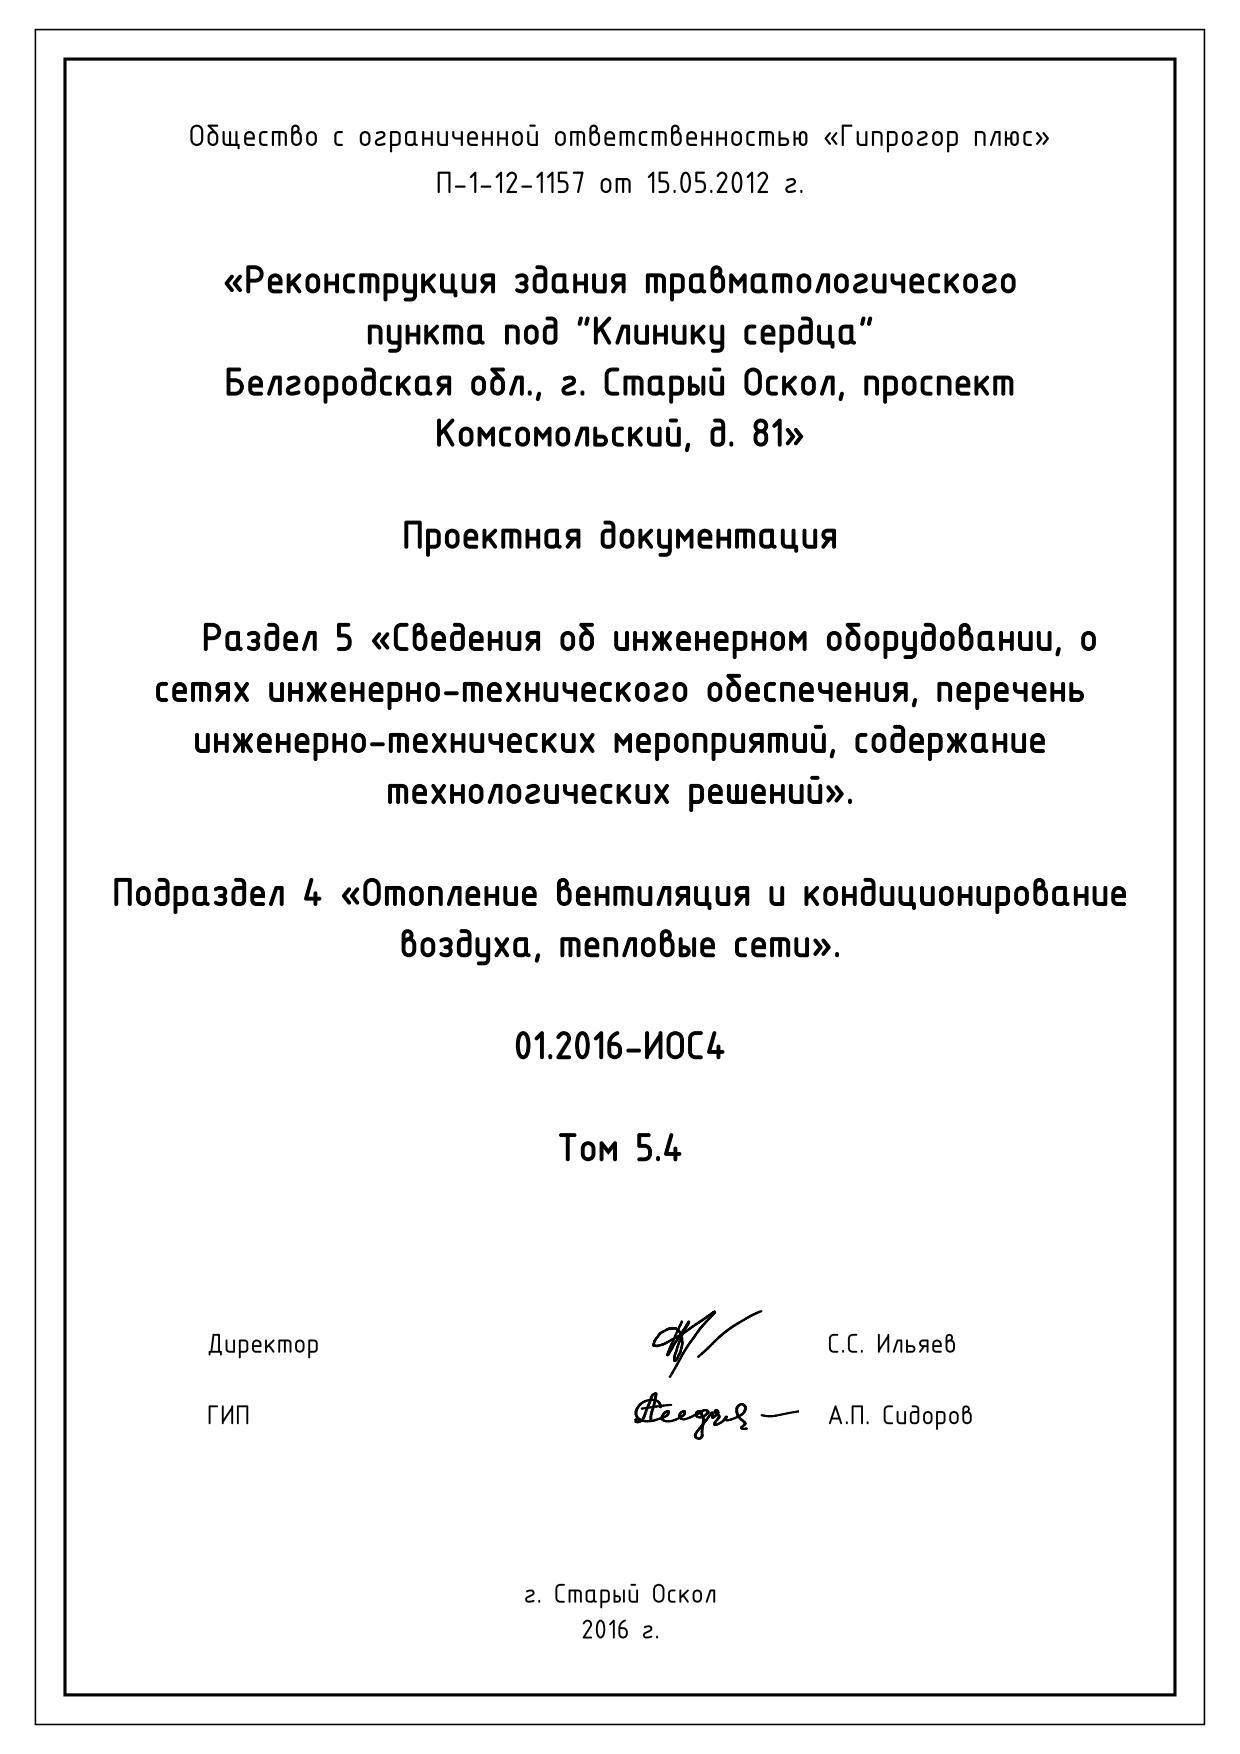 Депо 12-36-562